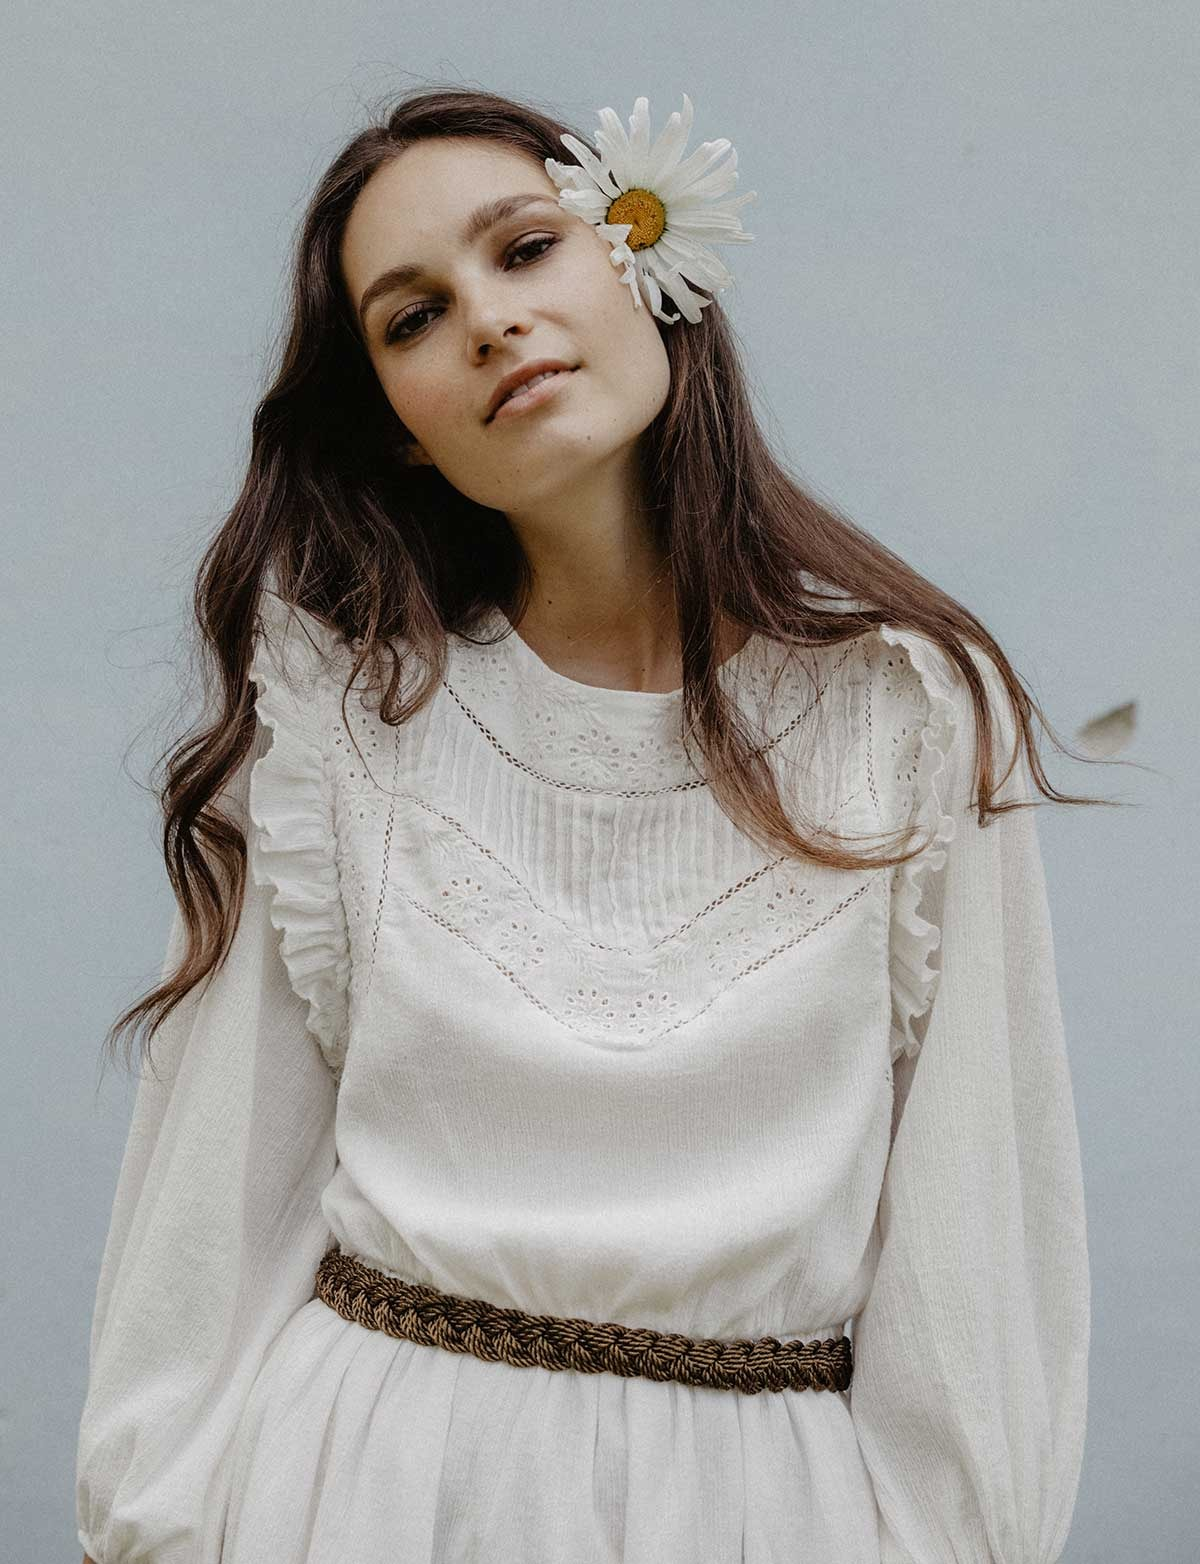 Moon Company introduceert Frans modemerk Louizon in Nederland